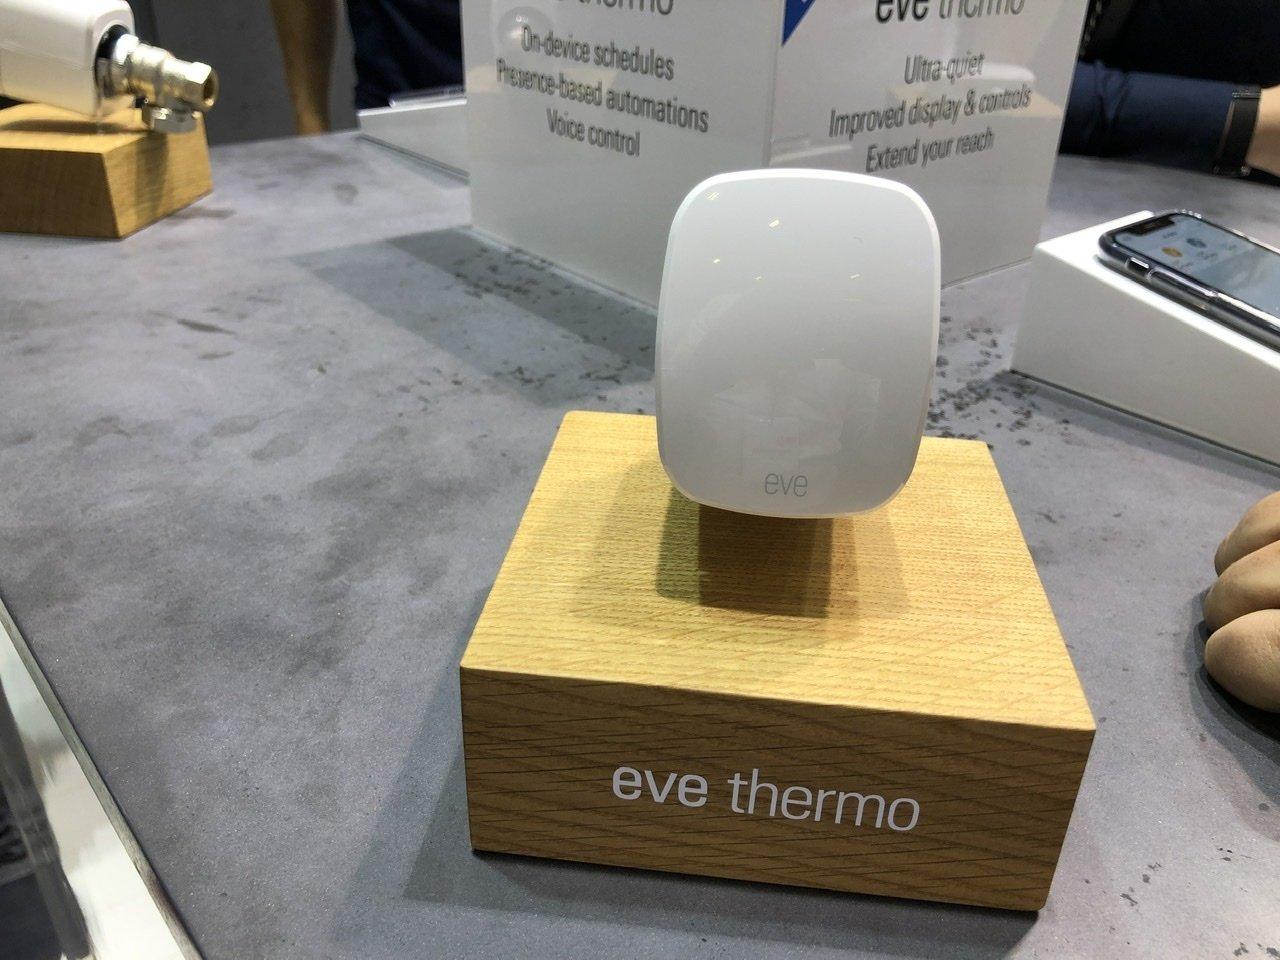 Evo thermo Ifa 2019